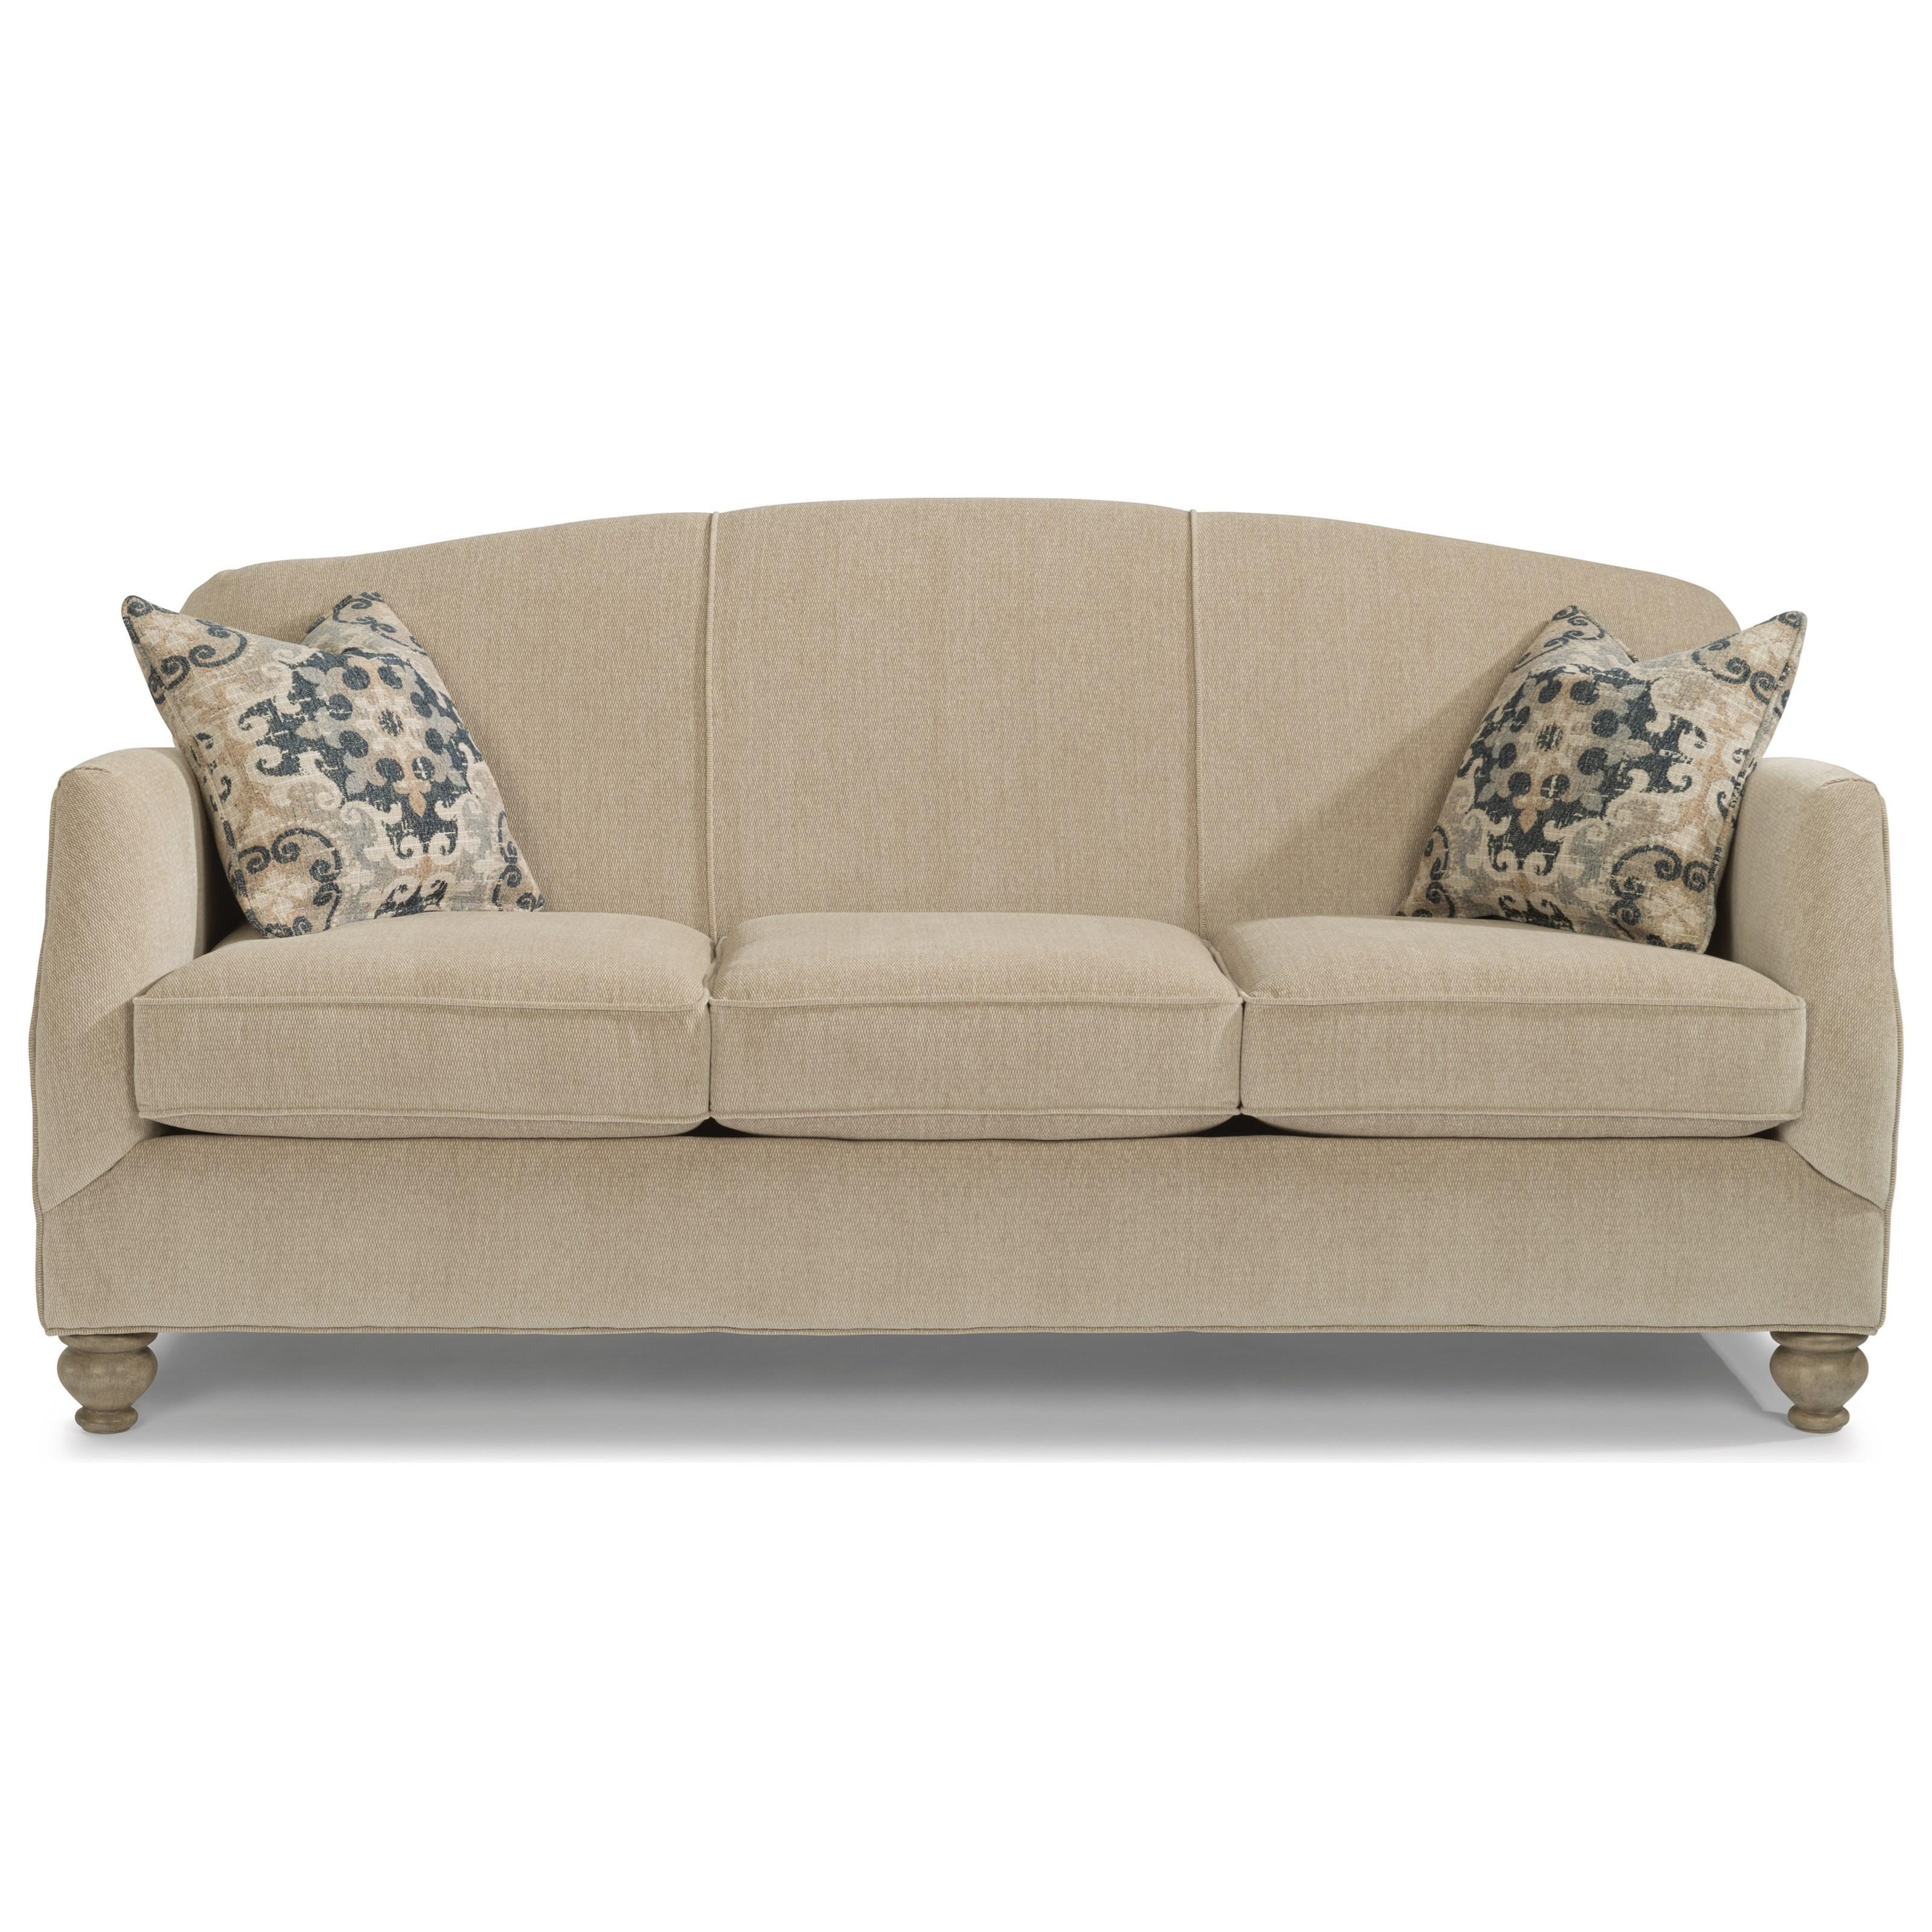 Flexsteel Plymouth Transitional Sofa With Bun Feet